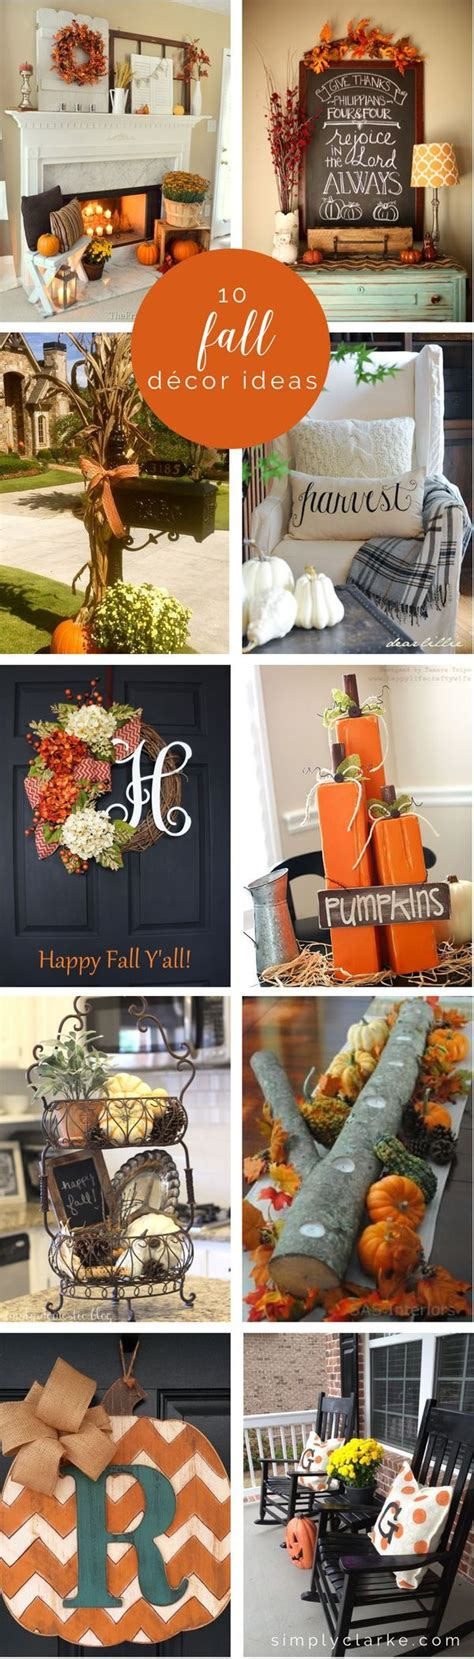 10 fall decor ideas inspiration holidays and autumn